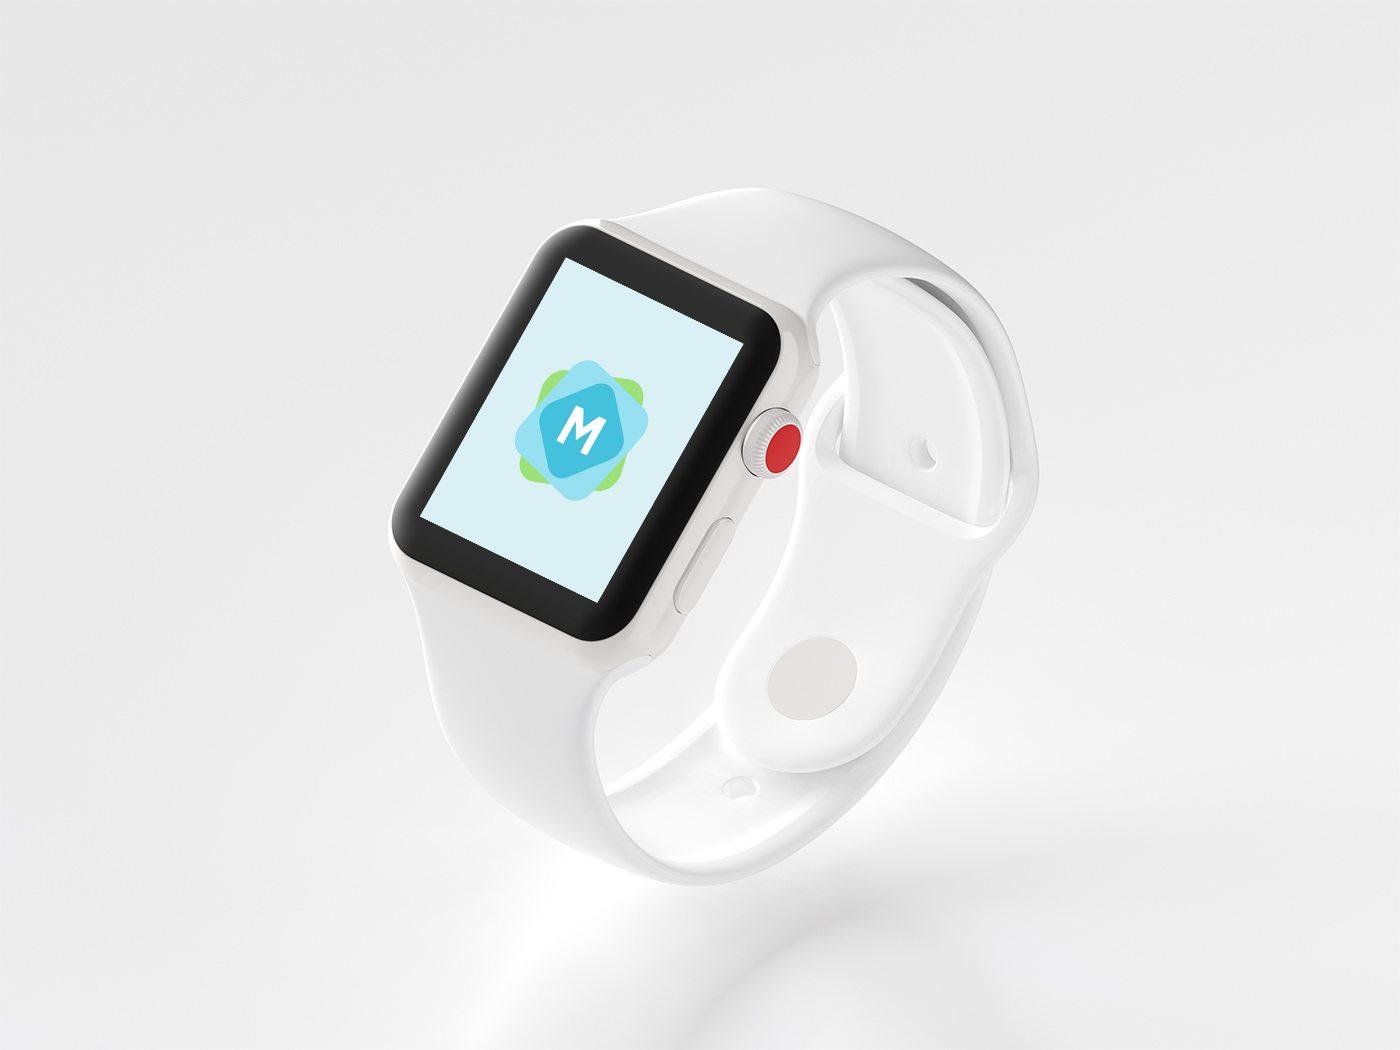 ceramic-apple-watch-3-mockup 50+ Apple Watch Mockups & Graphics design tips